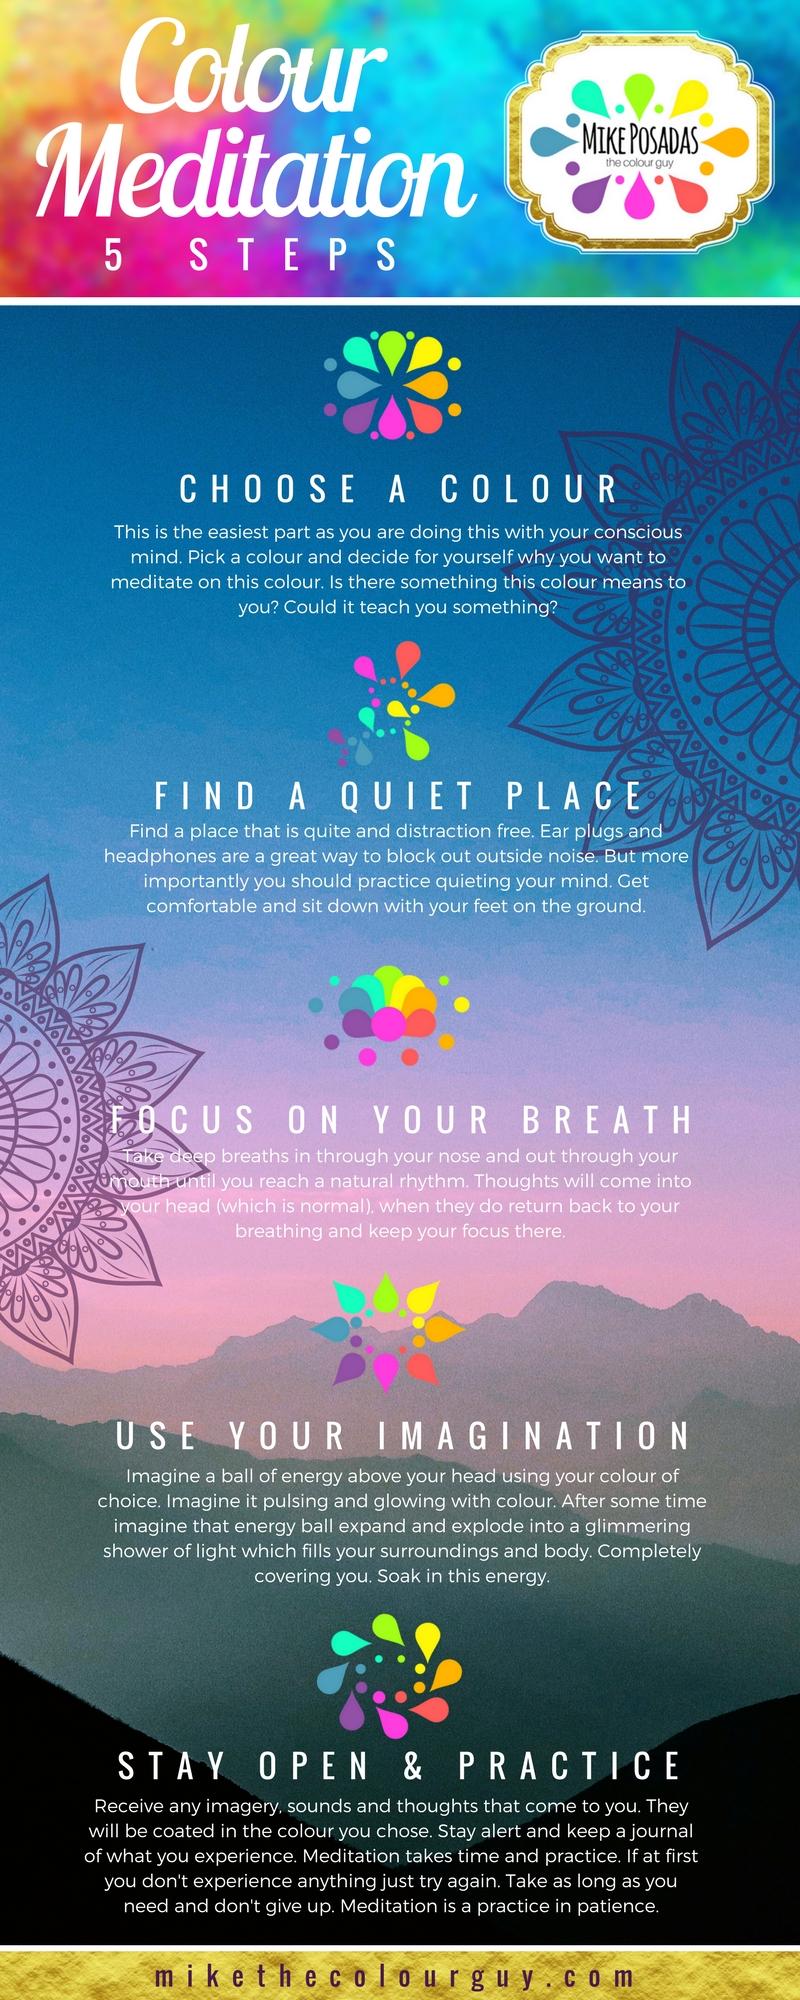 5 Step Colour Meditation